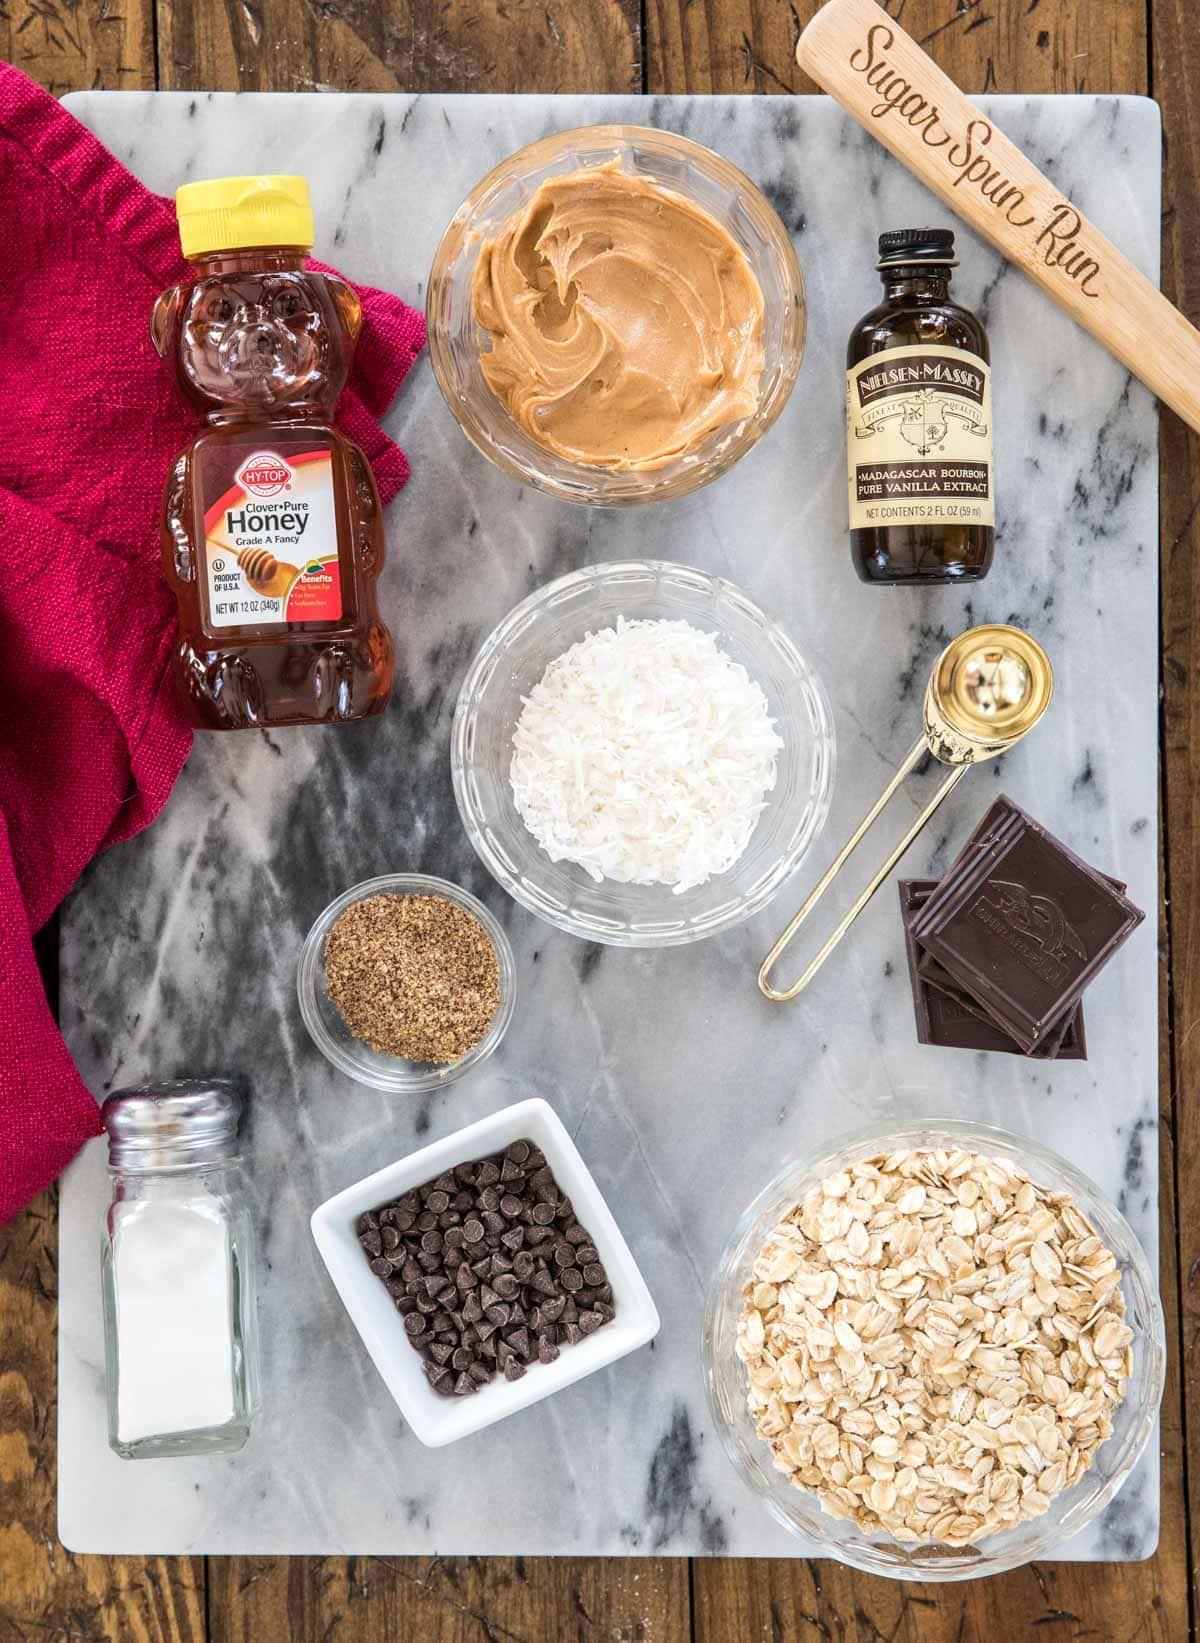 overhead view of ingredients